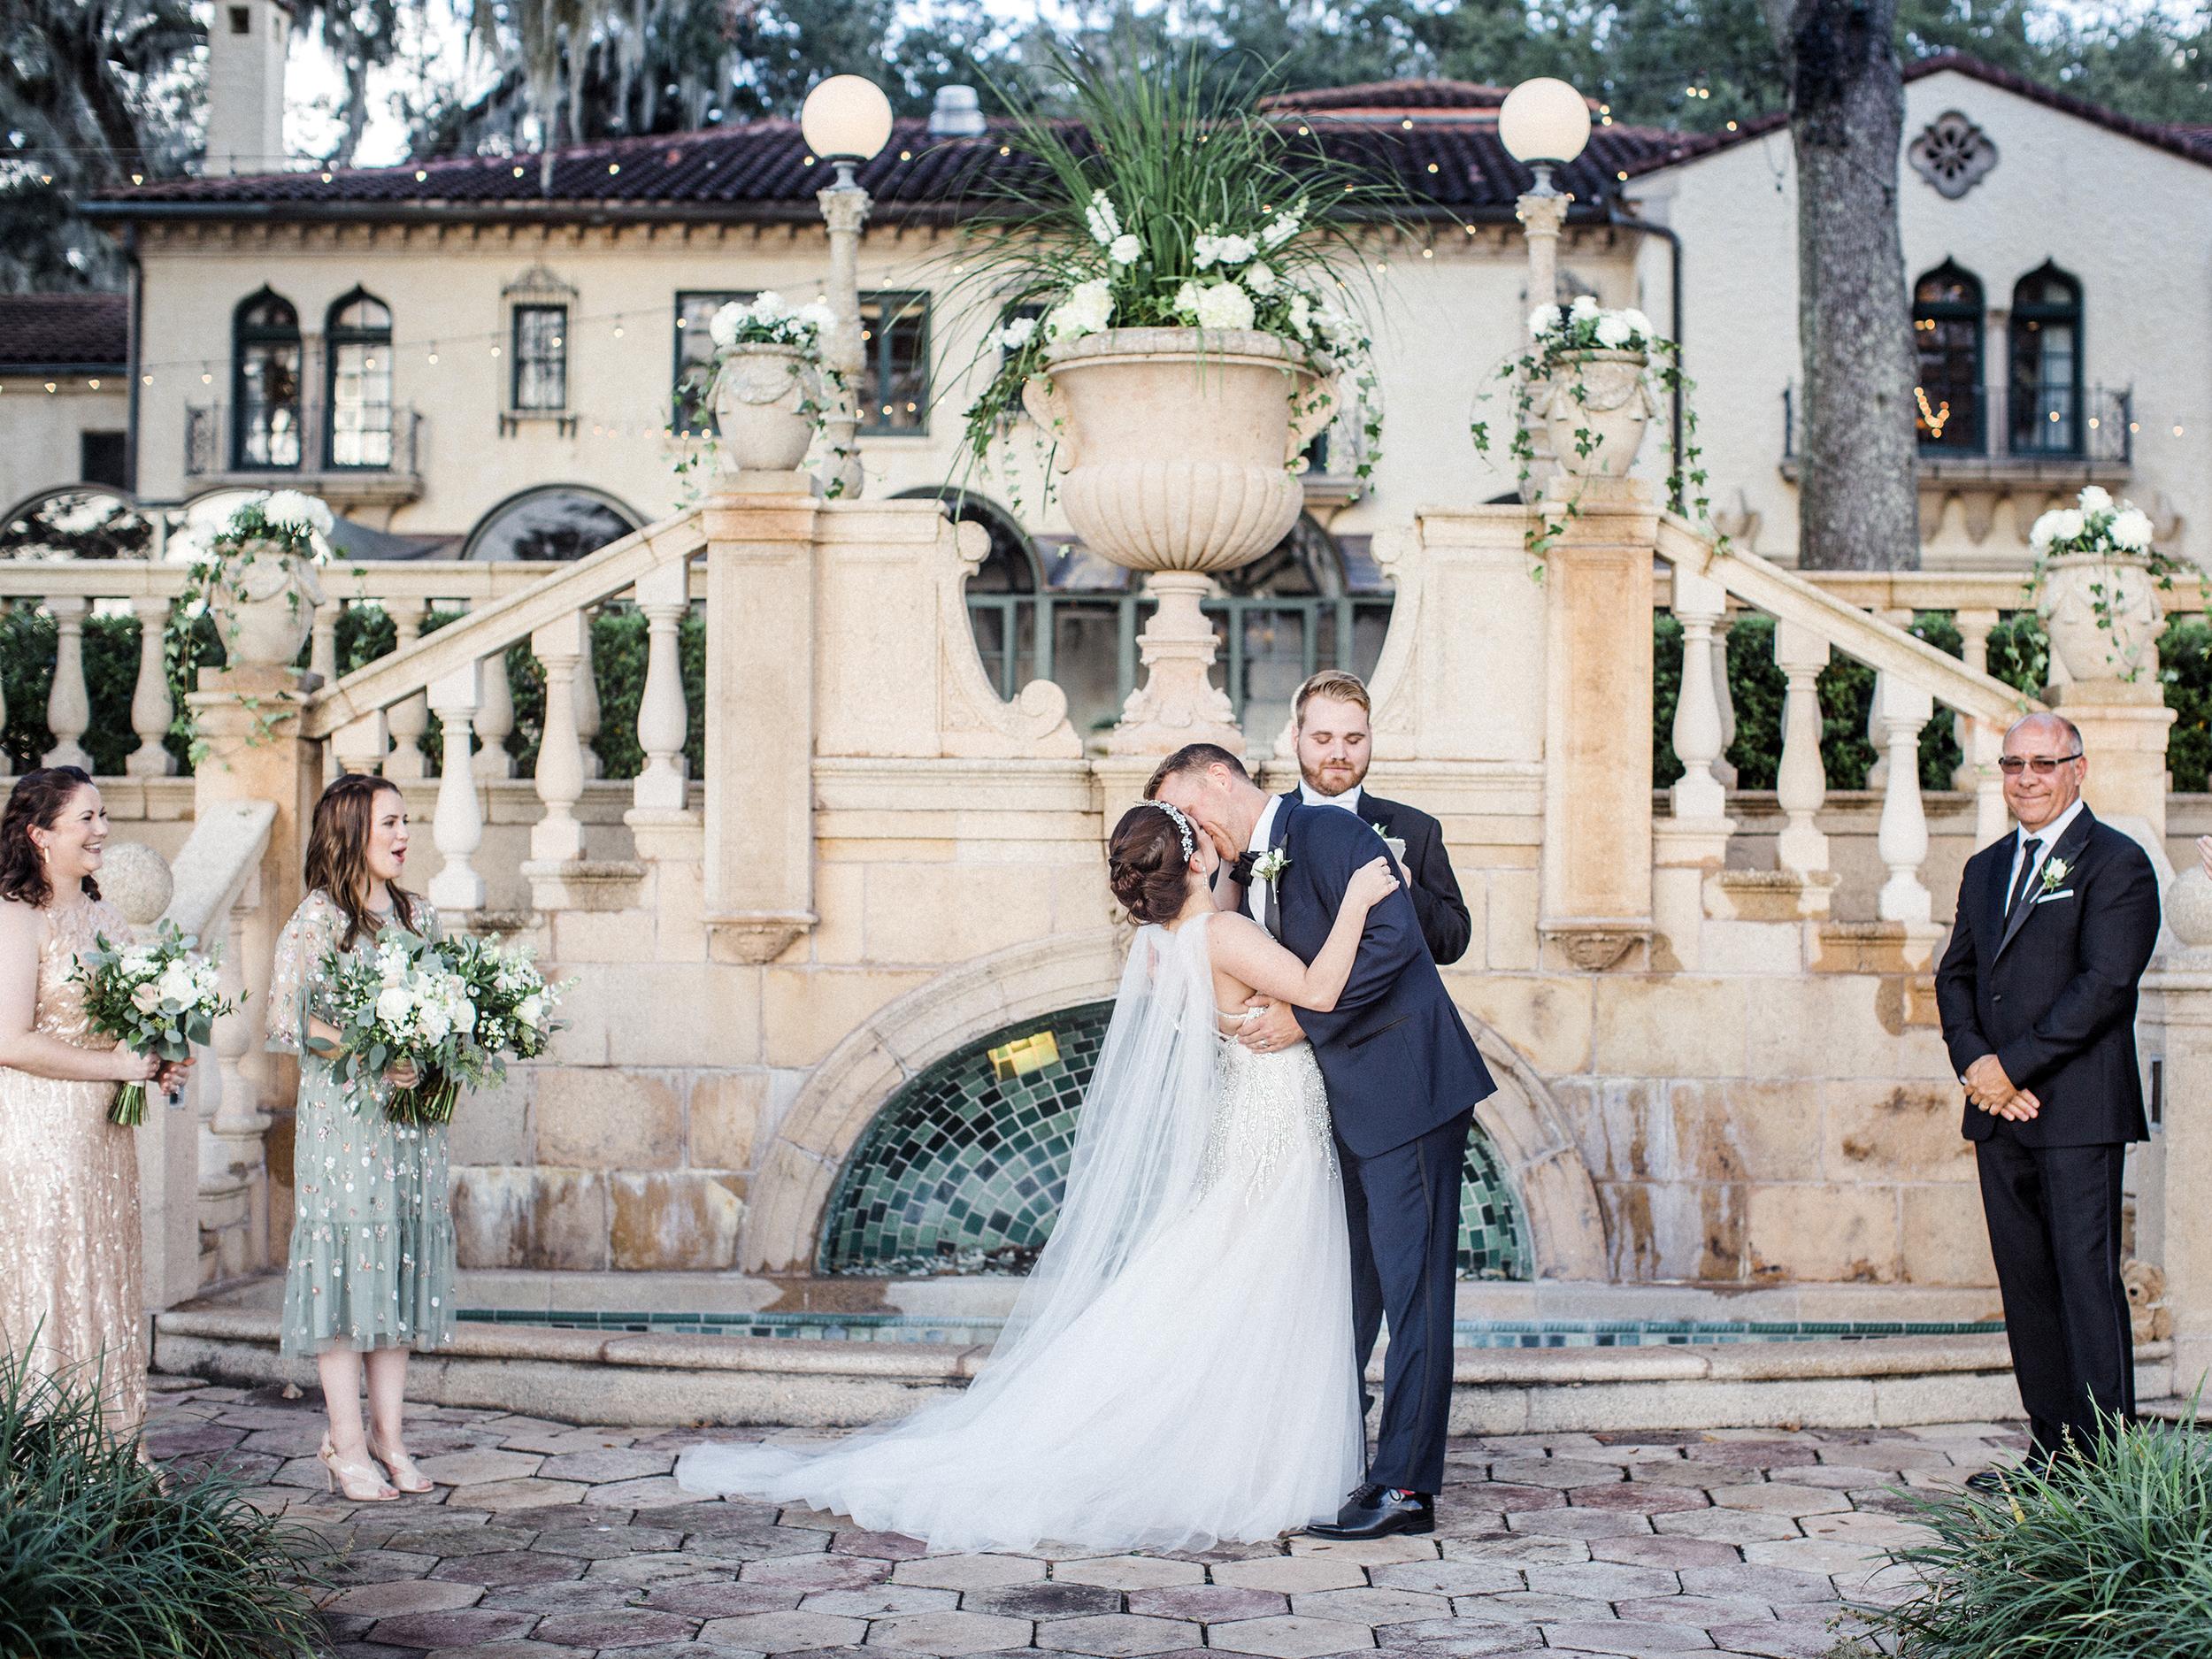 Lisa Silva Photography- Jacksonville, Florida Fine Art Film Wedding Photography Epping Forrest Yacht Club 42.jpg